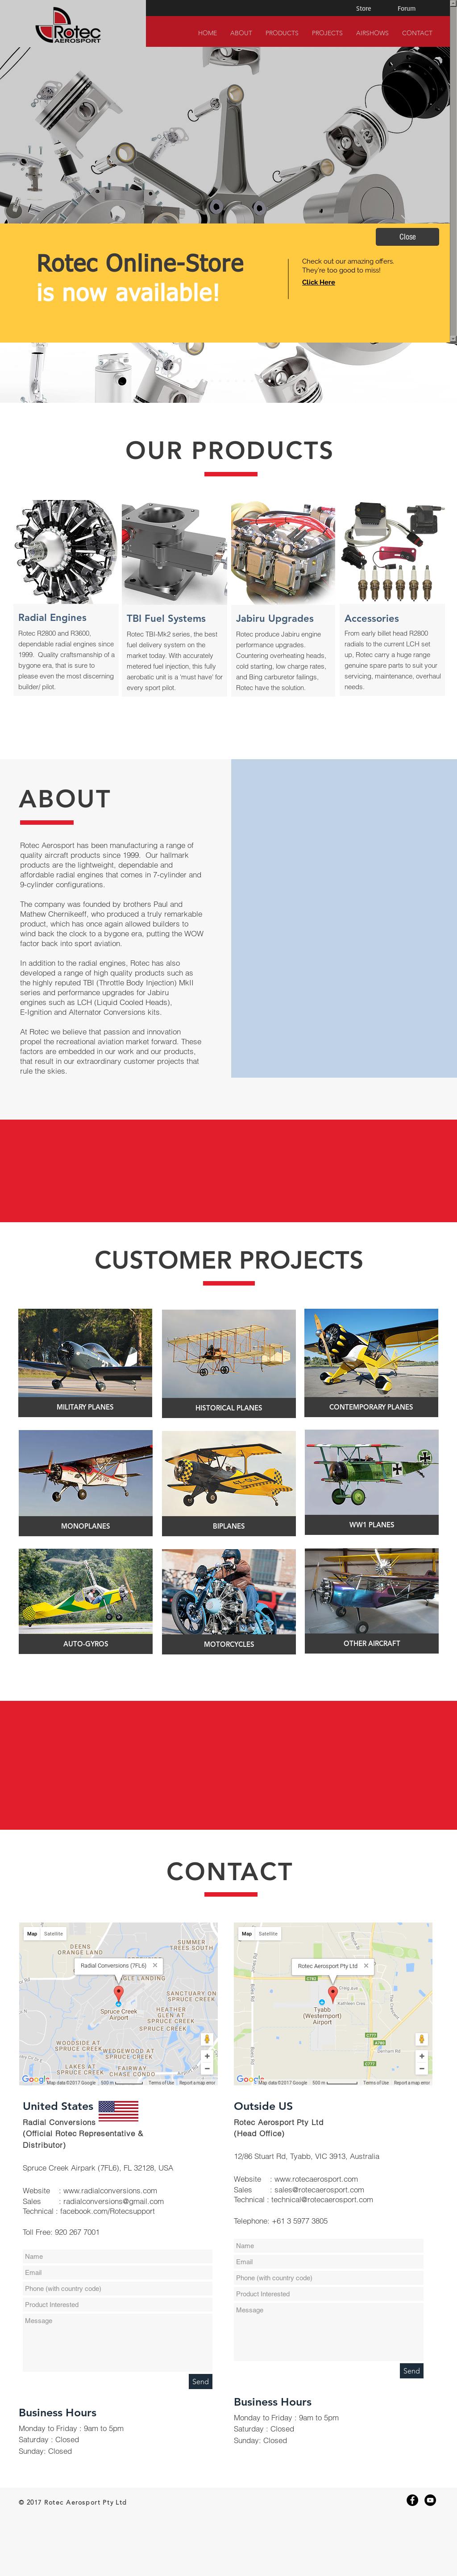 Rotec Aerosport Competitors, Revenue and Employees - Owler